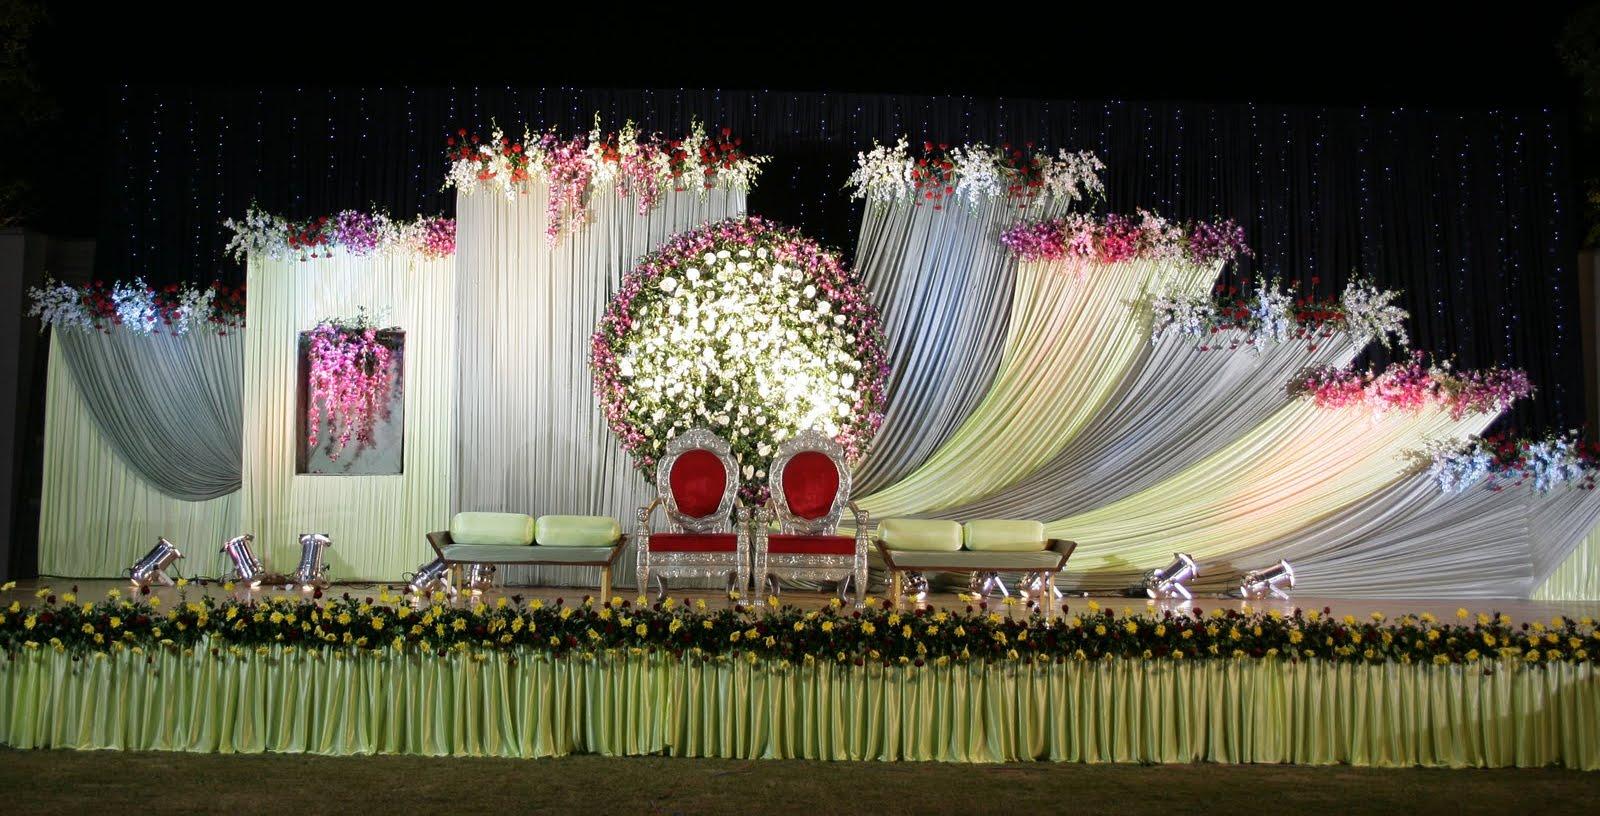 reception sangeet wedding flower decorations and event organizers in hyderabad shobha 39 s. Black Bedroom Furniture Sets. Home Design Ideas